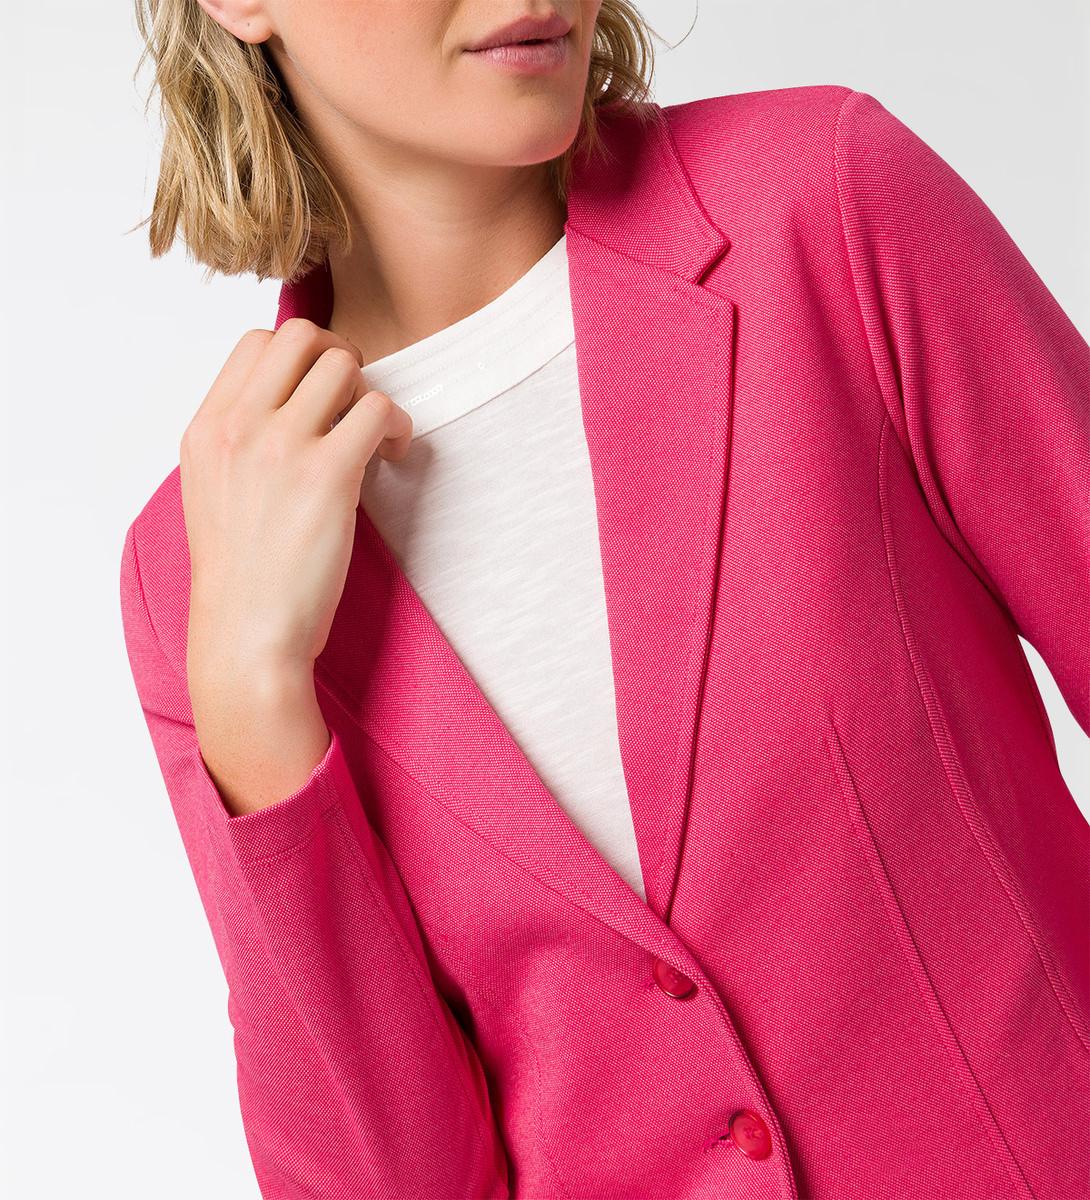 Blazer Bea in bright pink